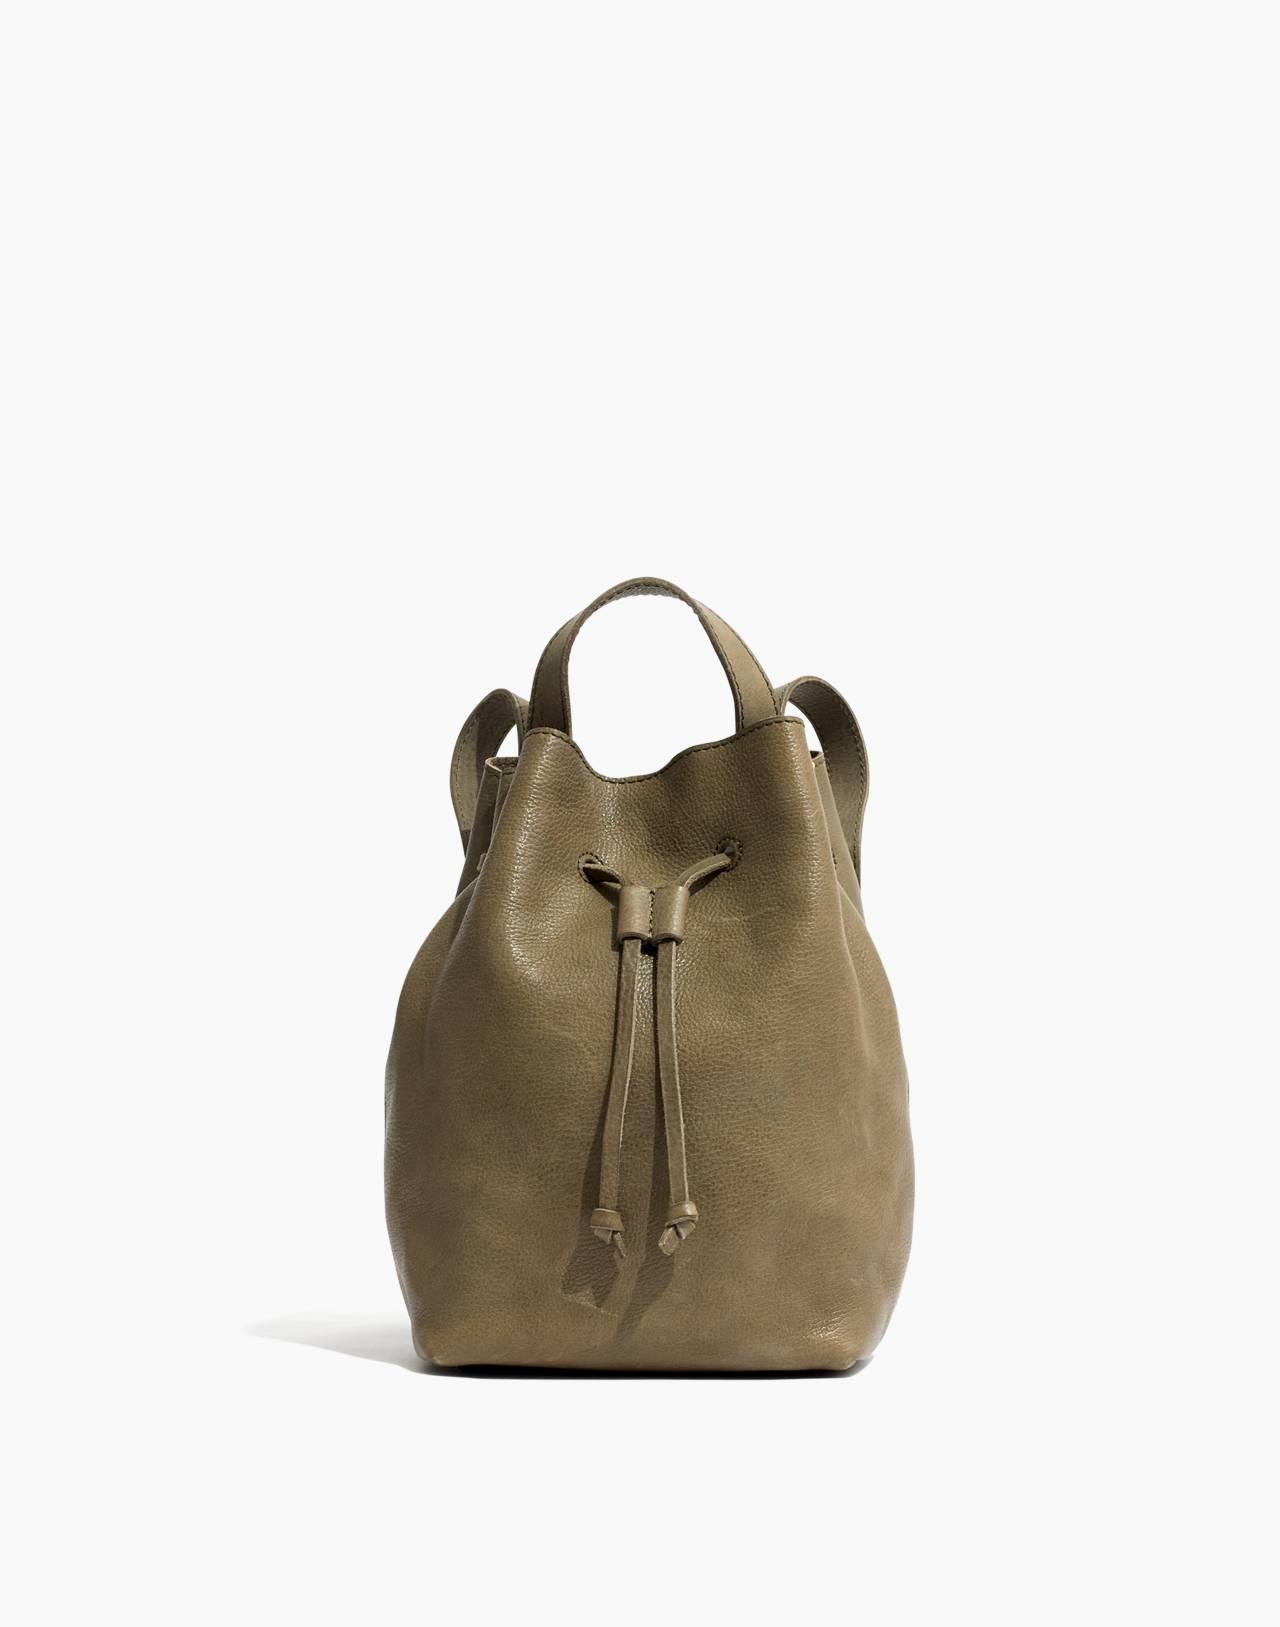 The Somerset Mini Backpack in forgotten landscape image 1